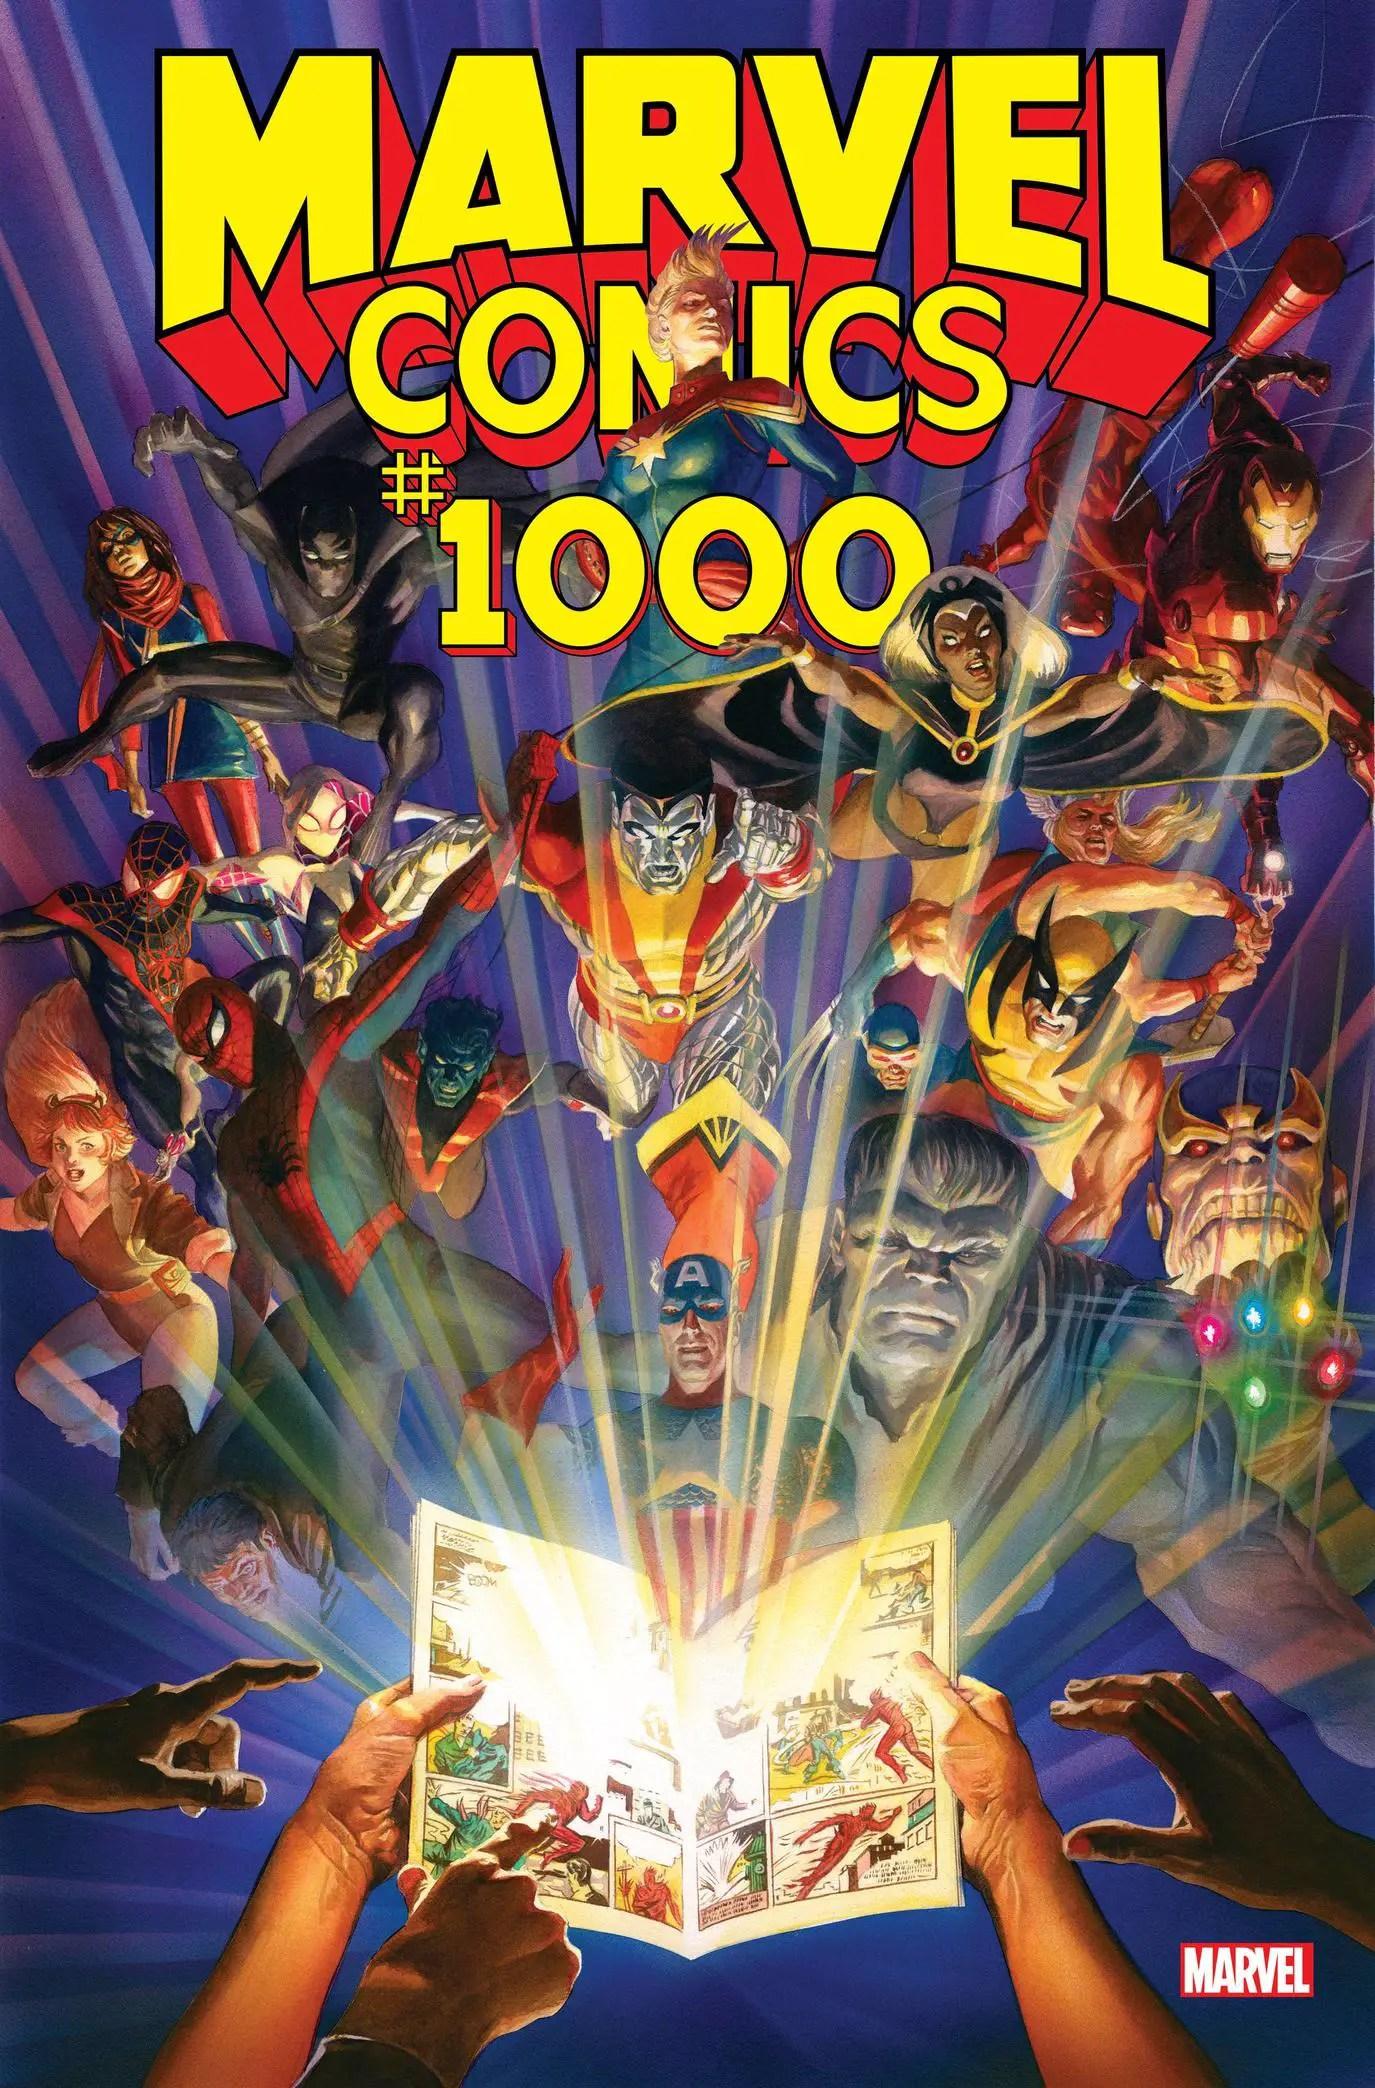 'Marvel Comics' #1000 Review: Remarkably enjoyable, even delightful